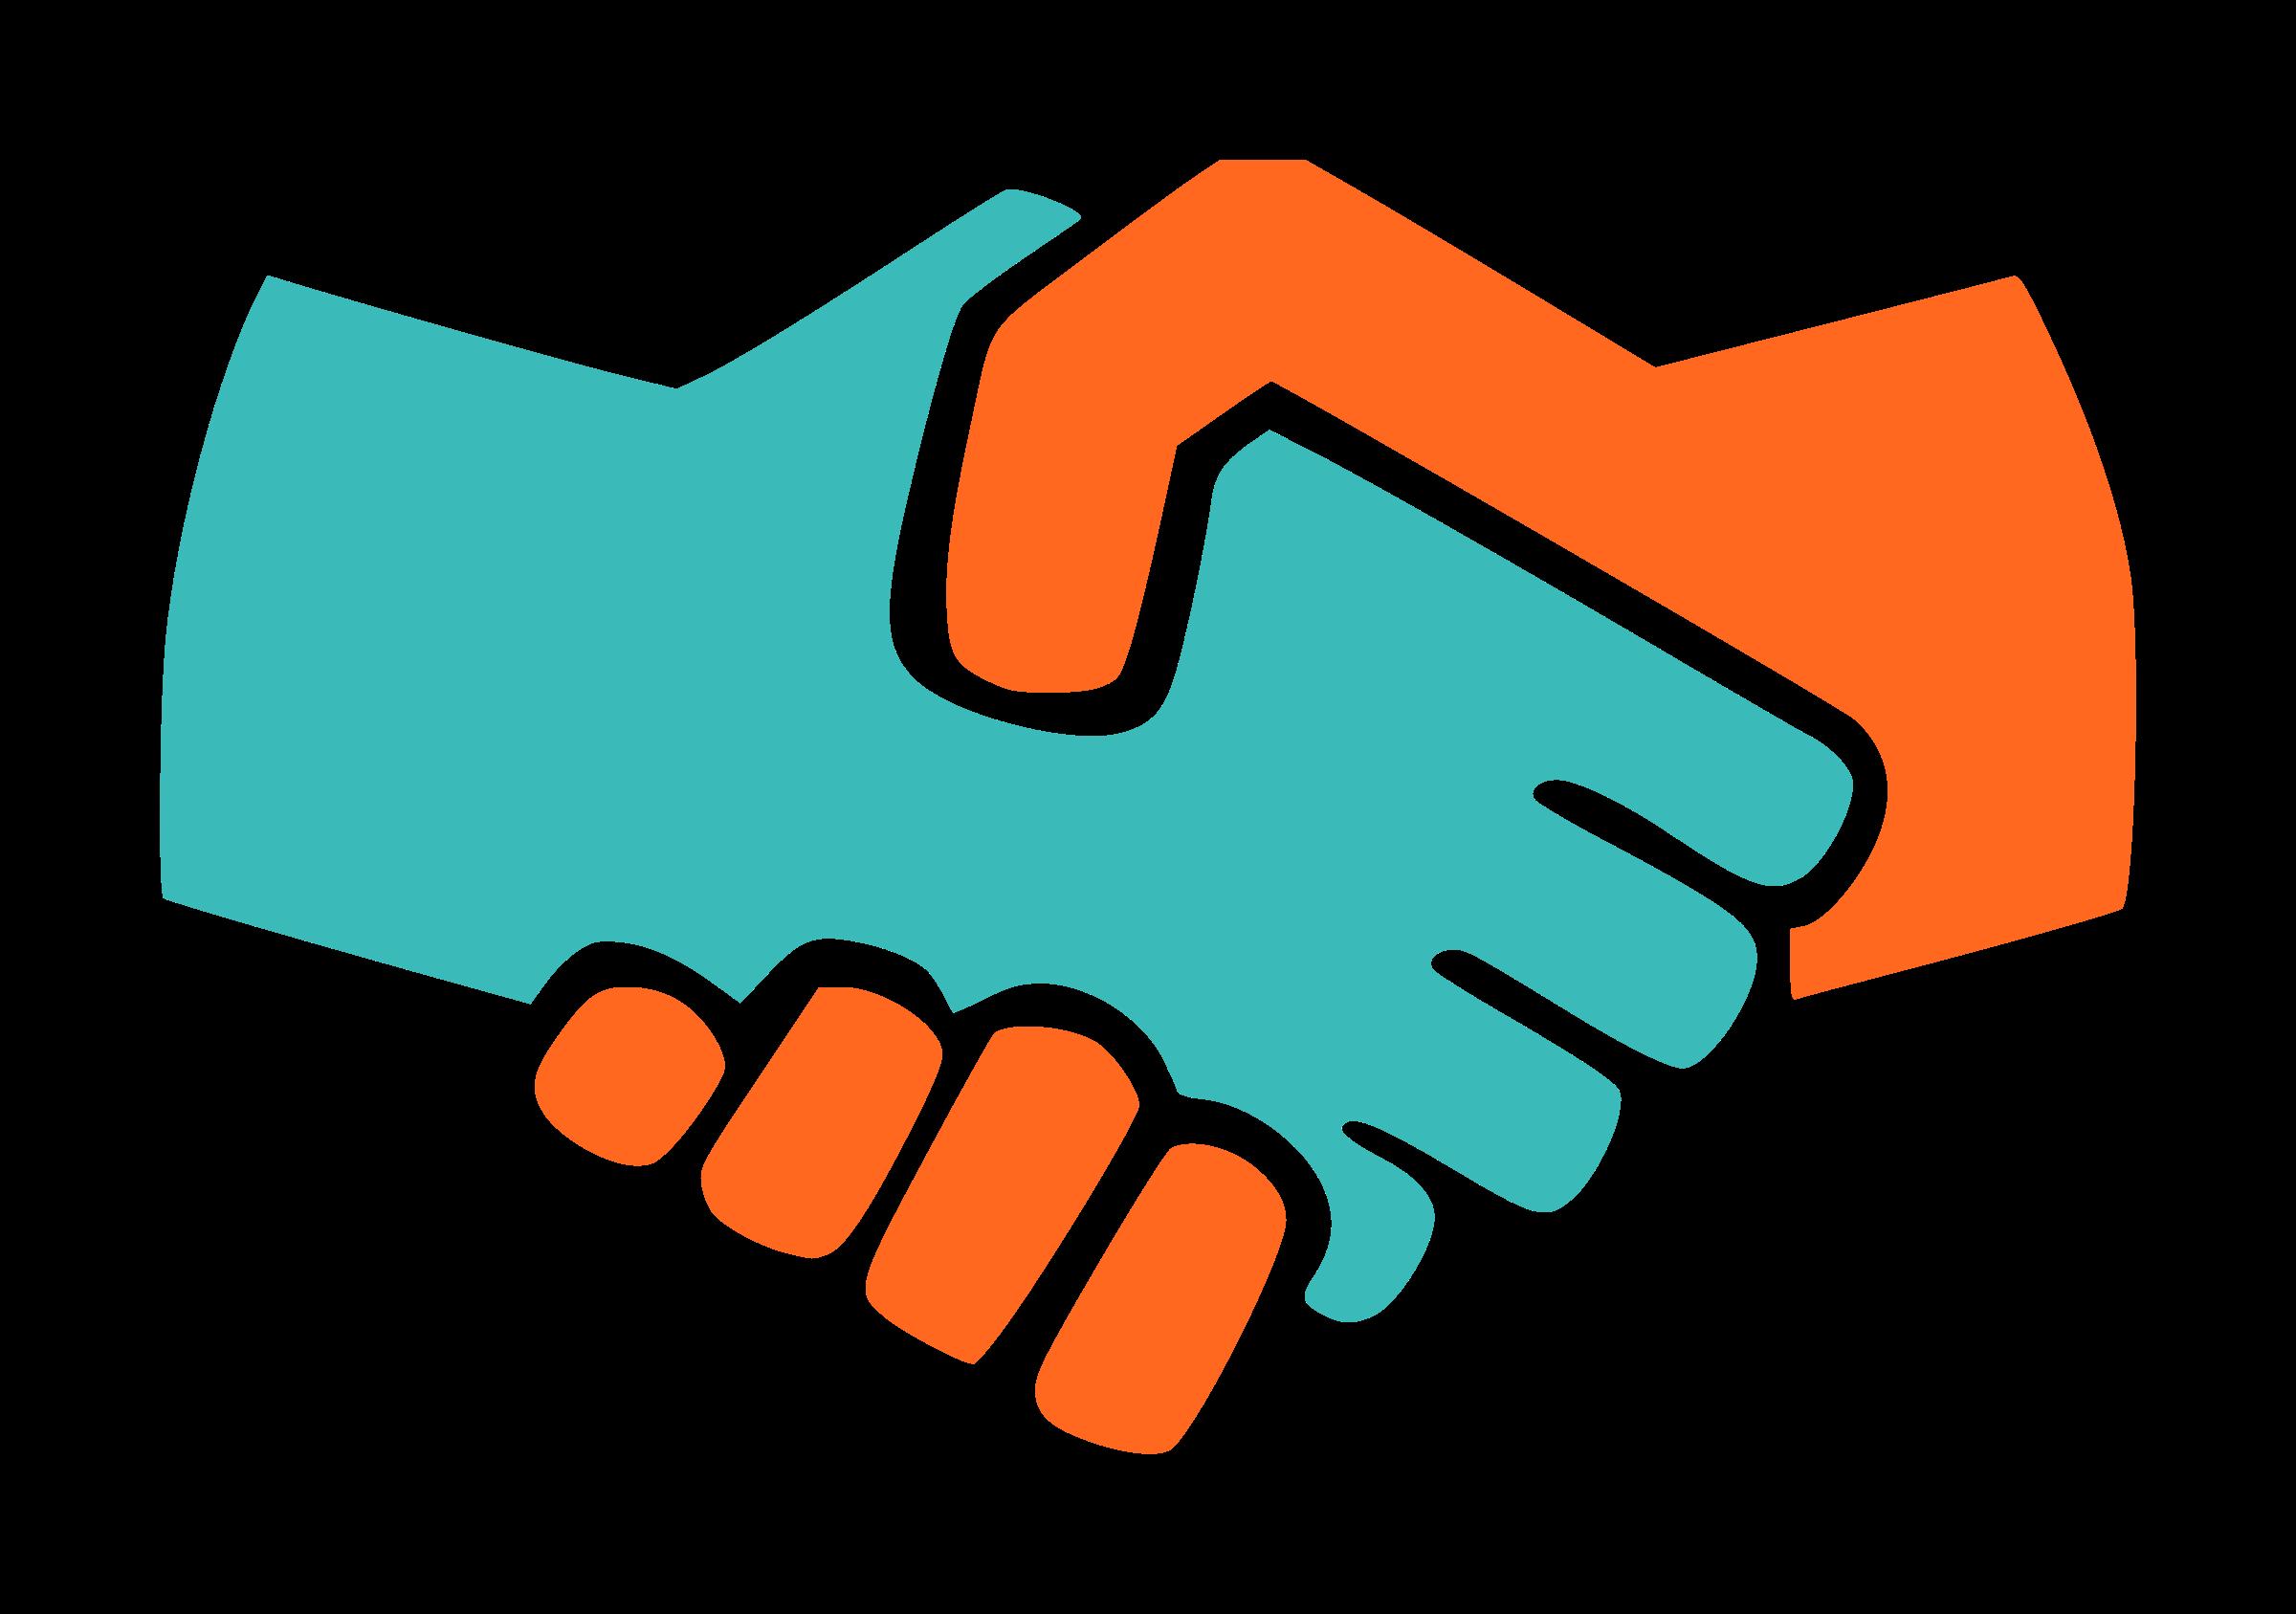 Handshake clipart logo. Png hd transparent images